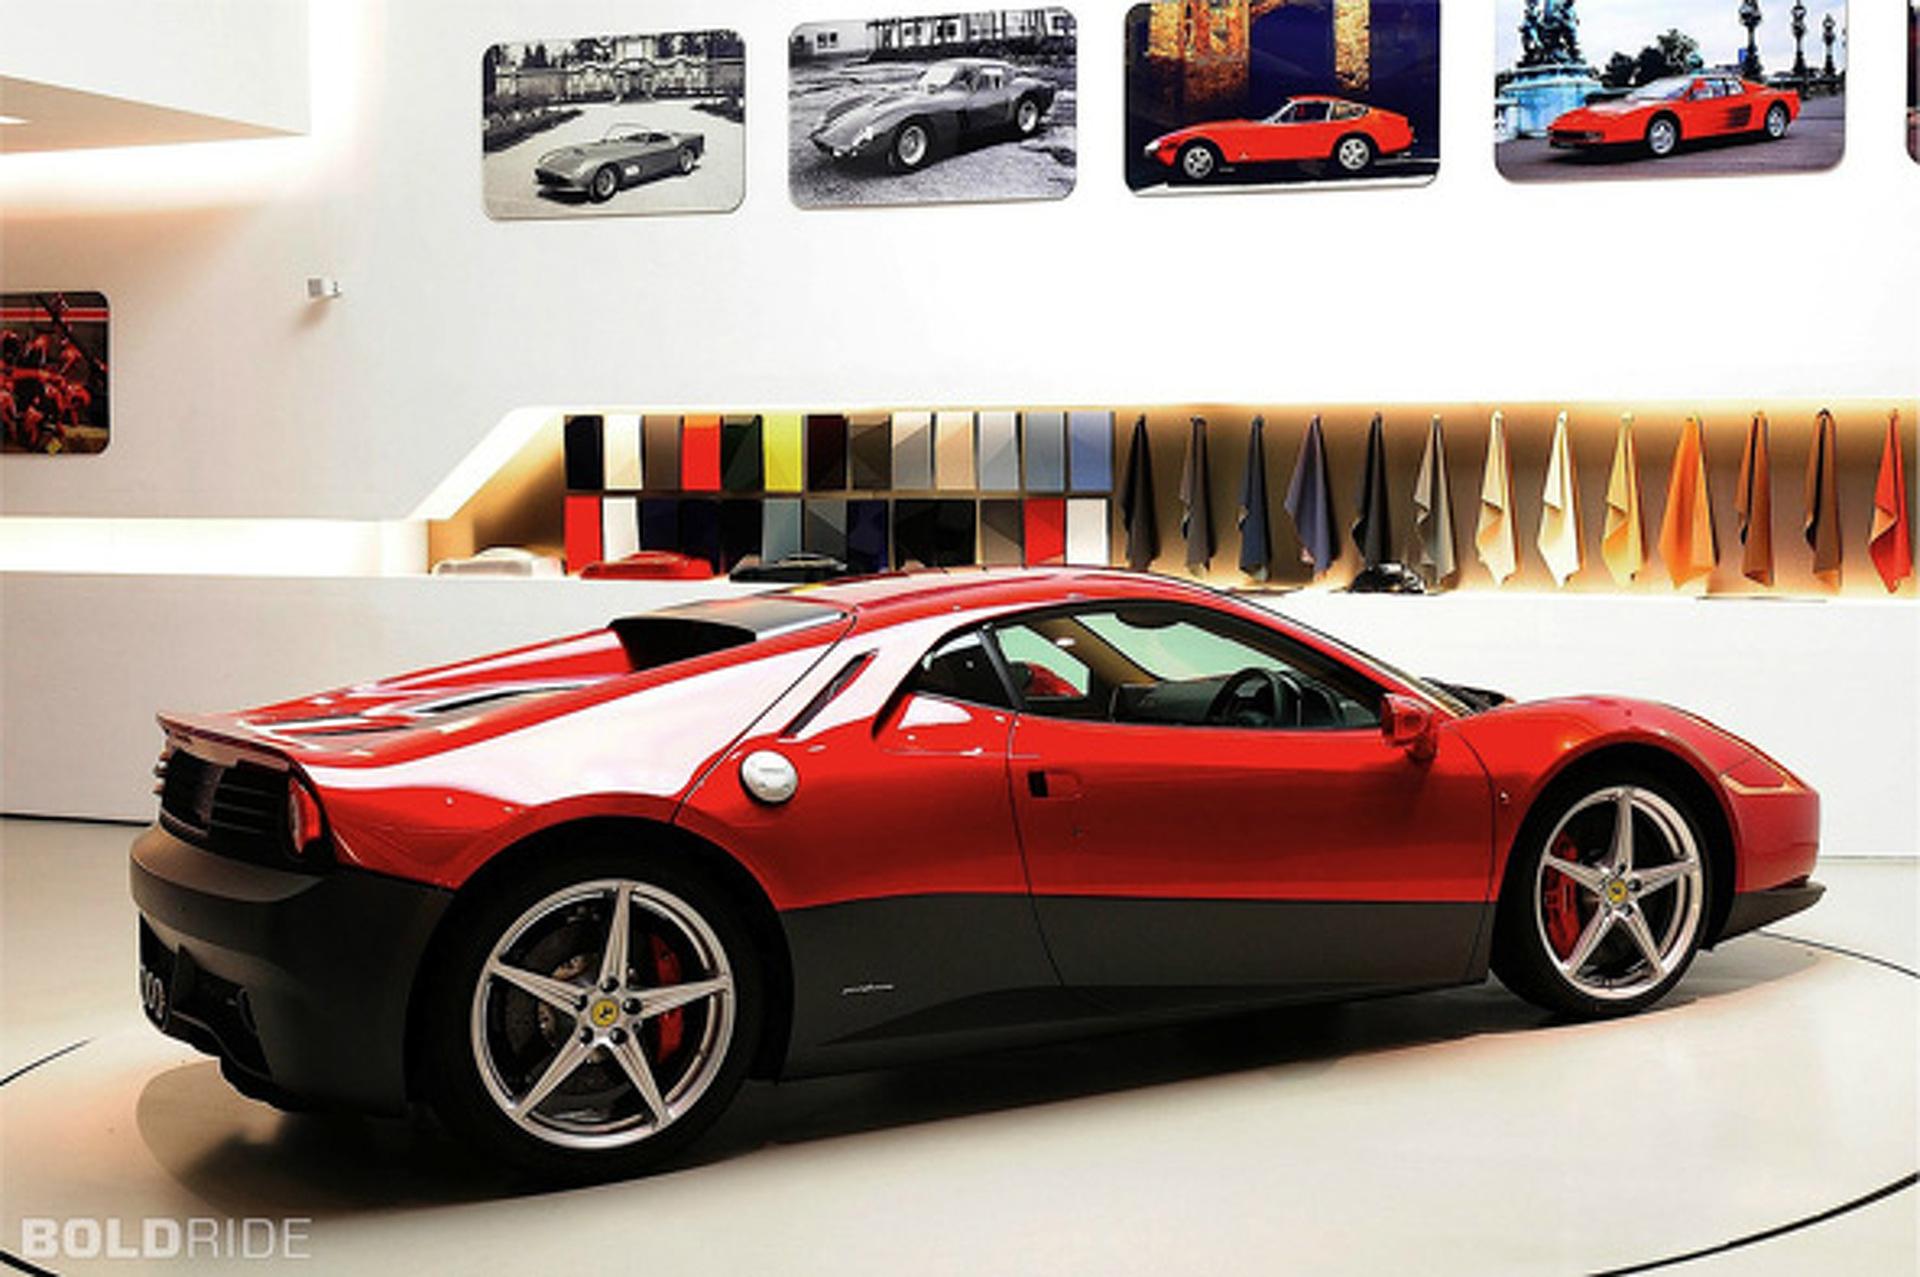 Slowhand, Fast Car: Clapton Commissions $4.7M Custom Ferrari